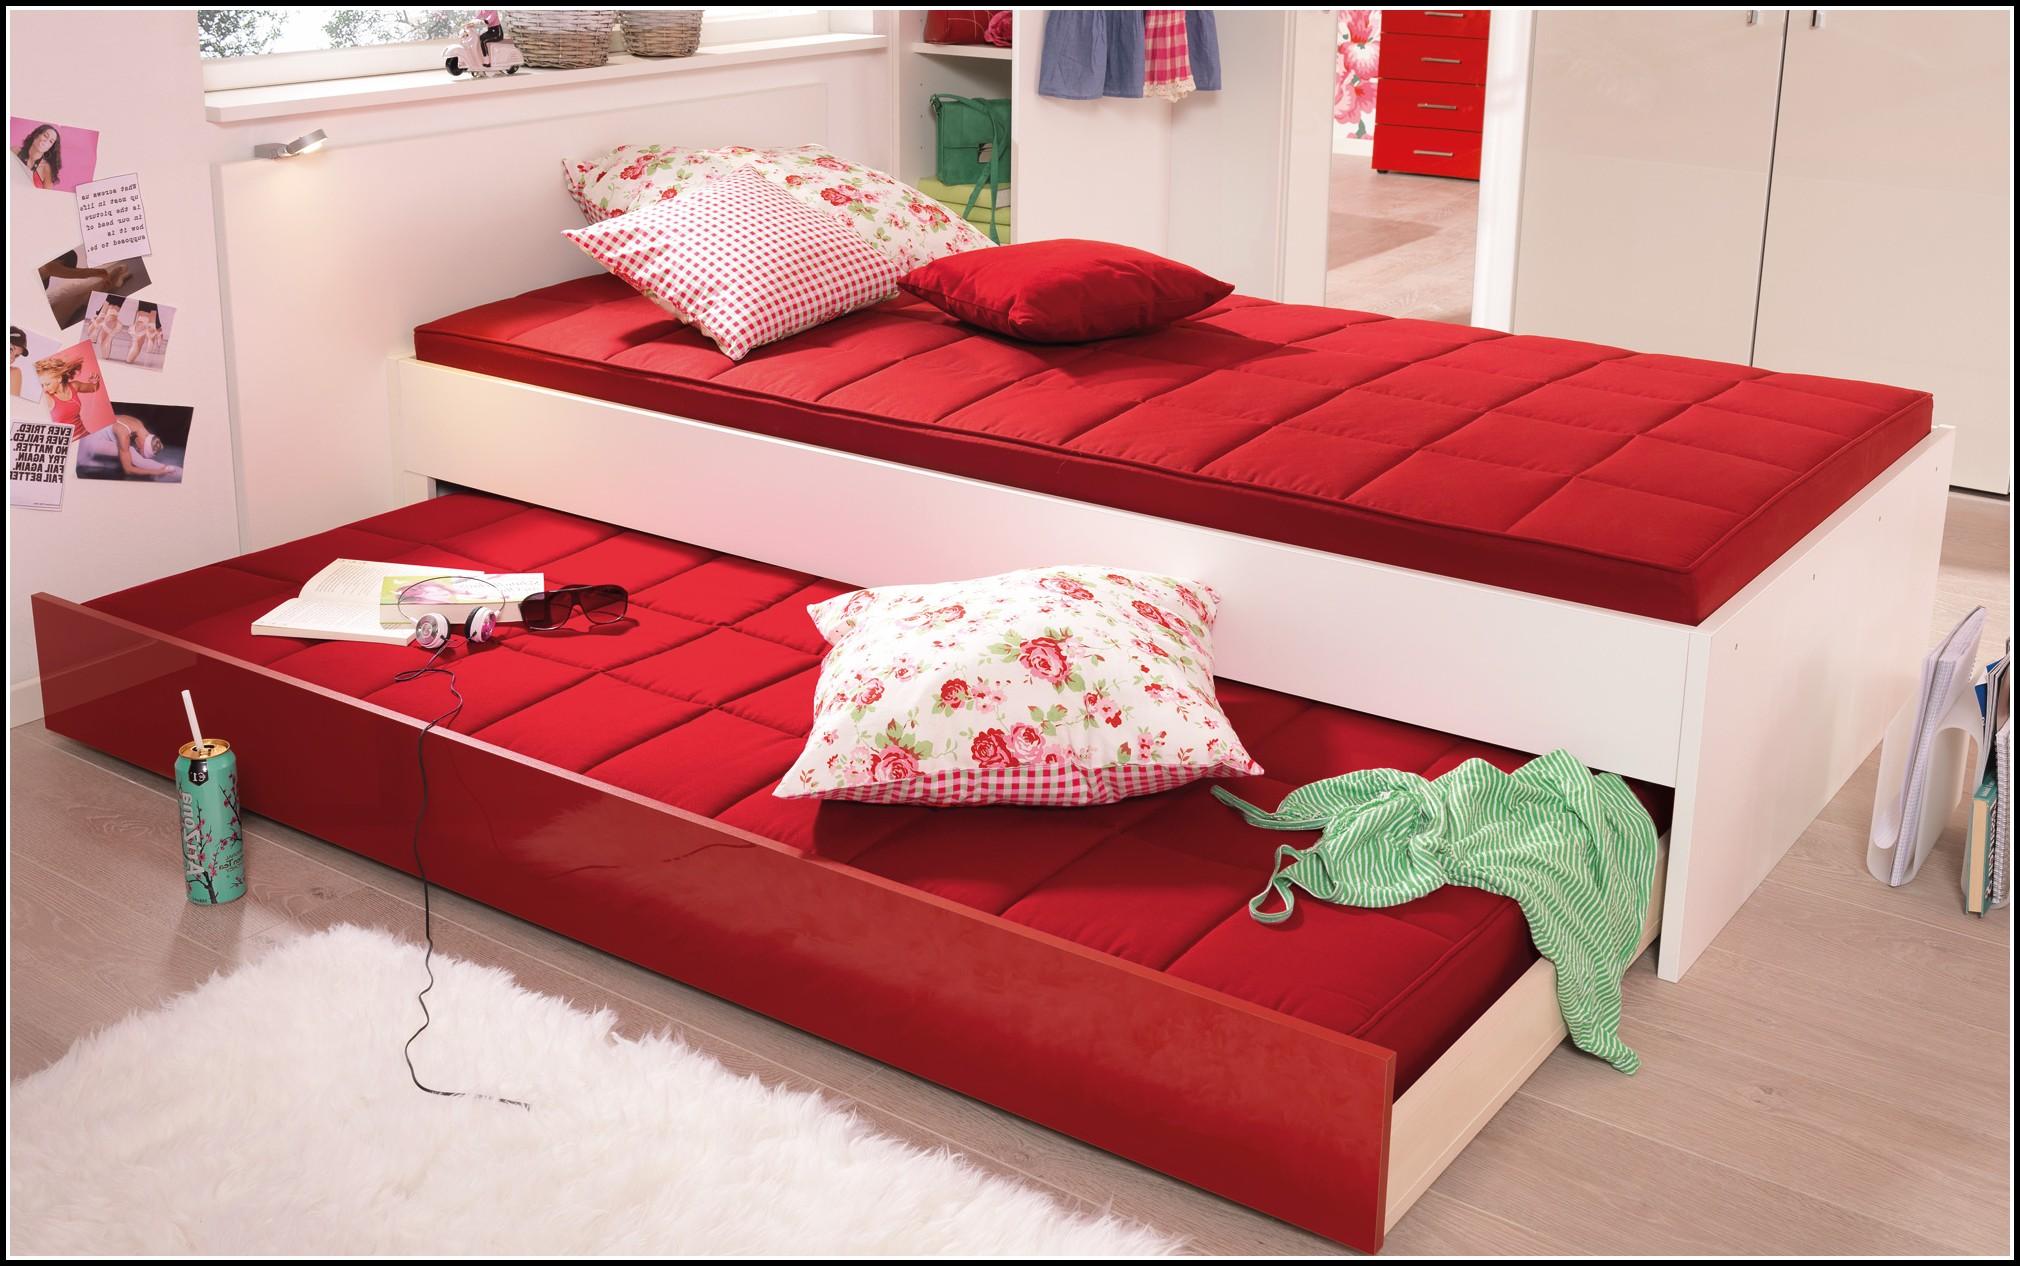 bett 90x200 weis hochglanz betten house und dekor galerie xp1odqordj. Black Bedroom Furniture Sets. Home Design Ideas